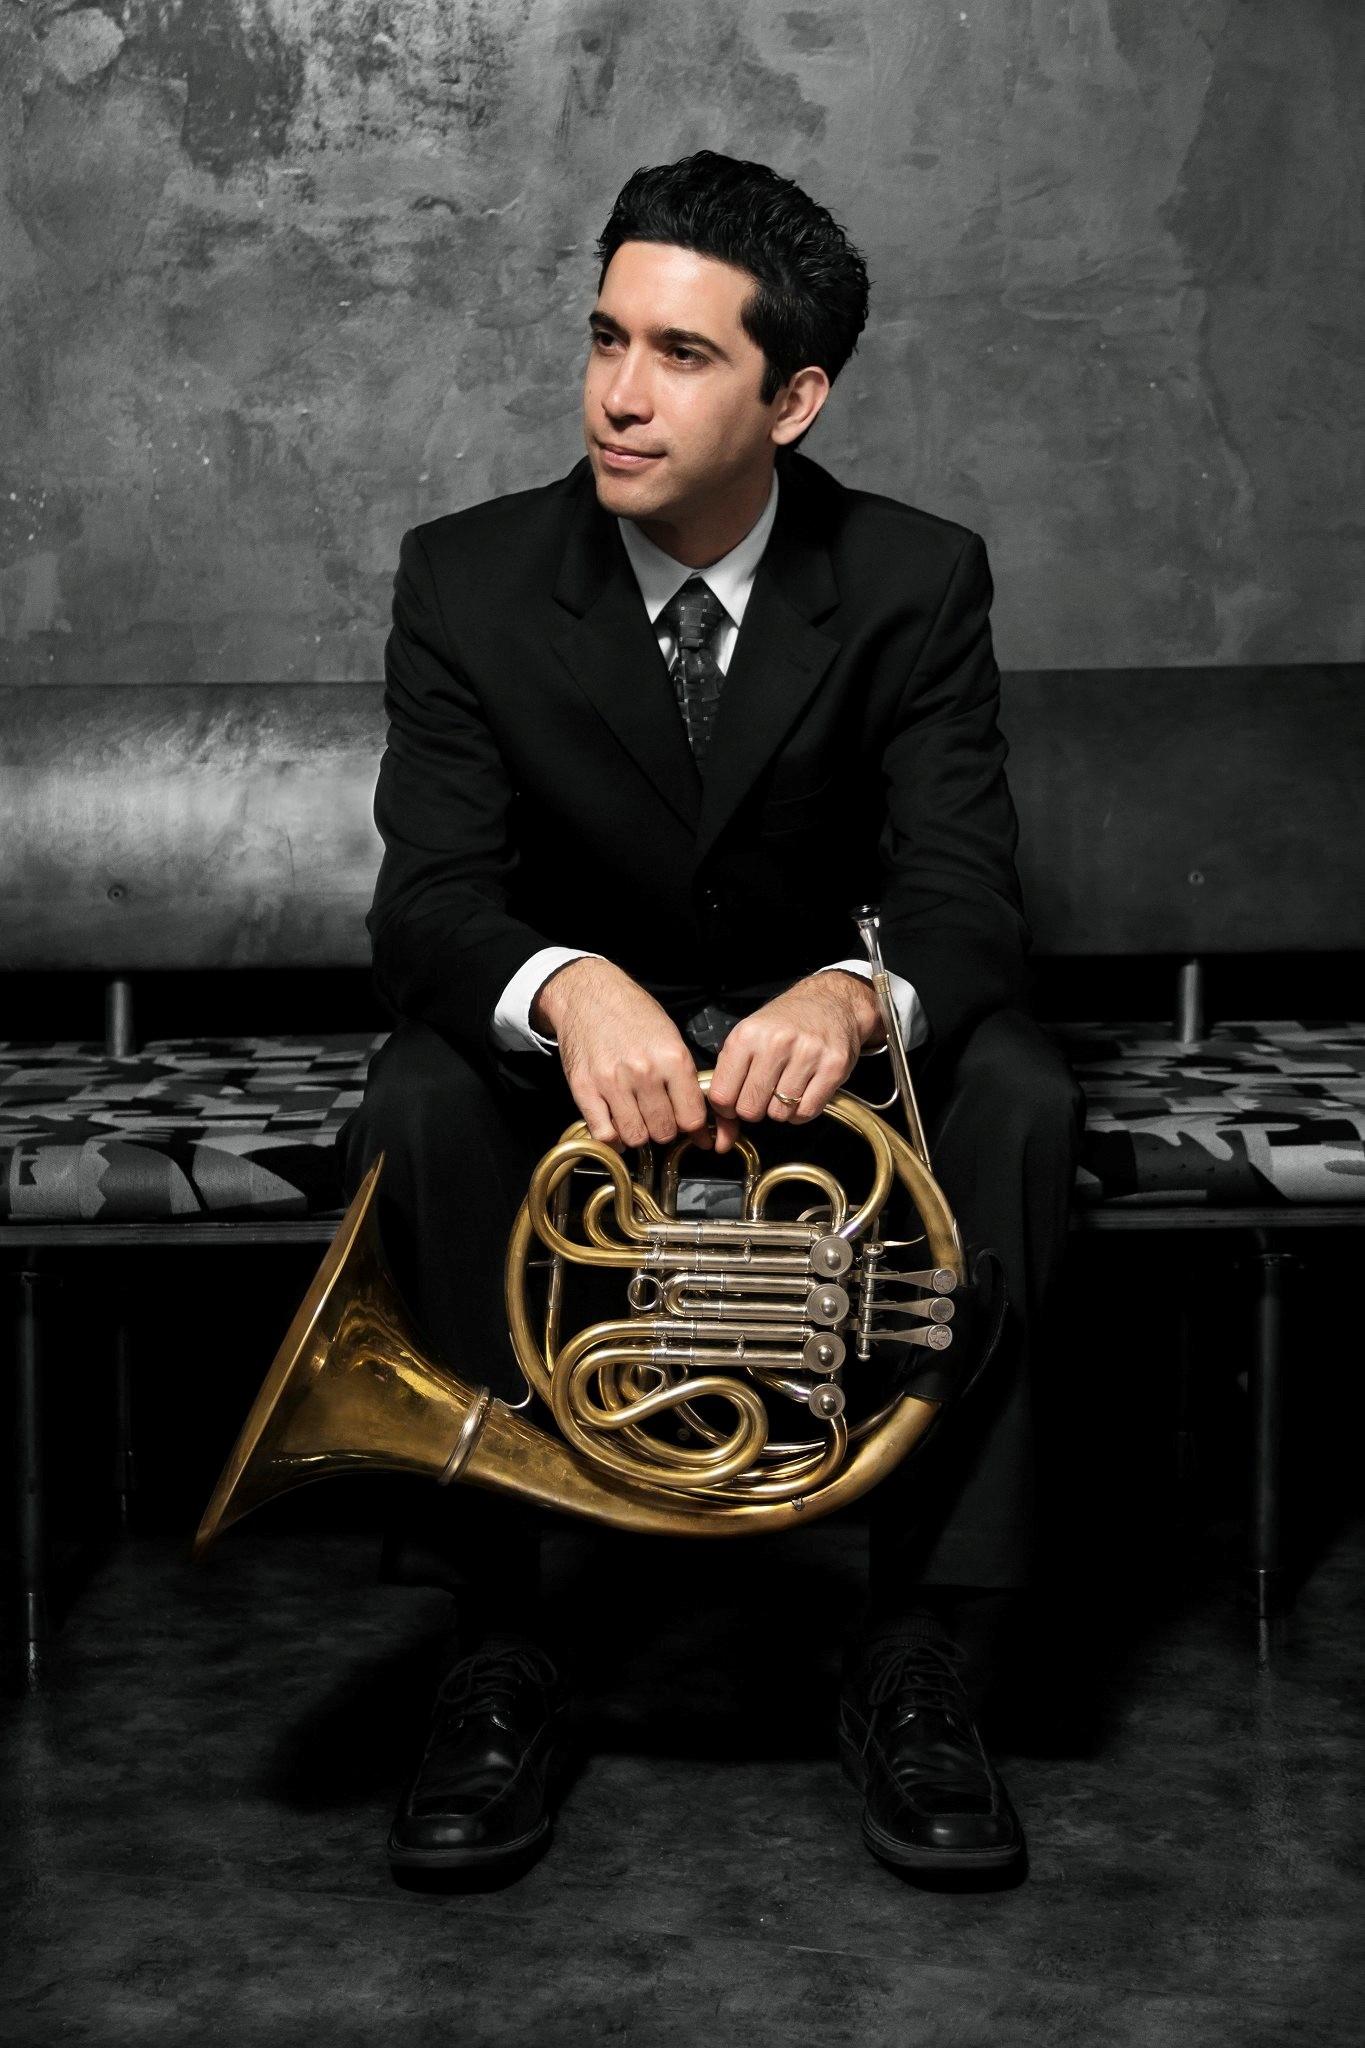 Gustavo Camacho